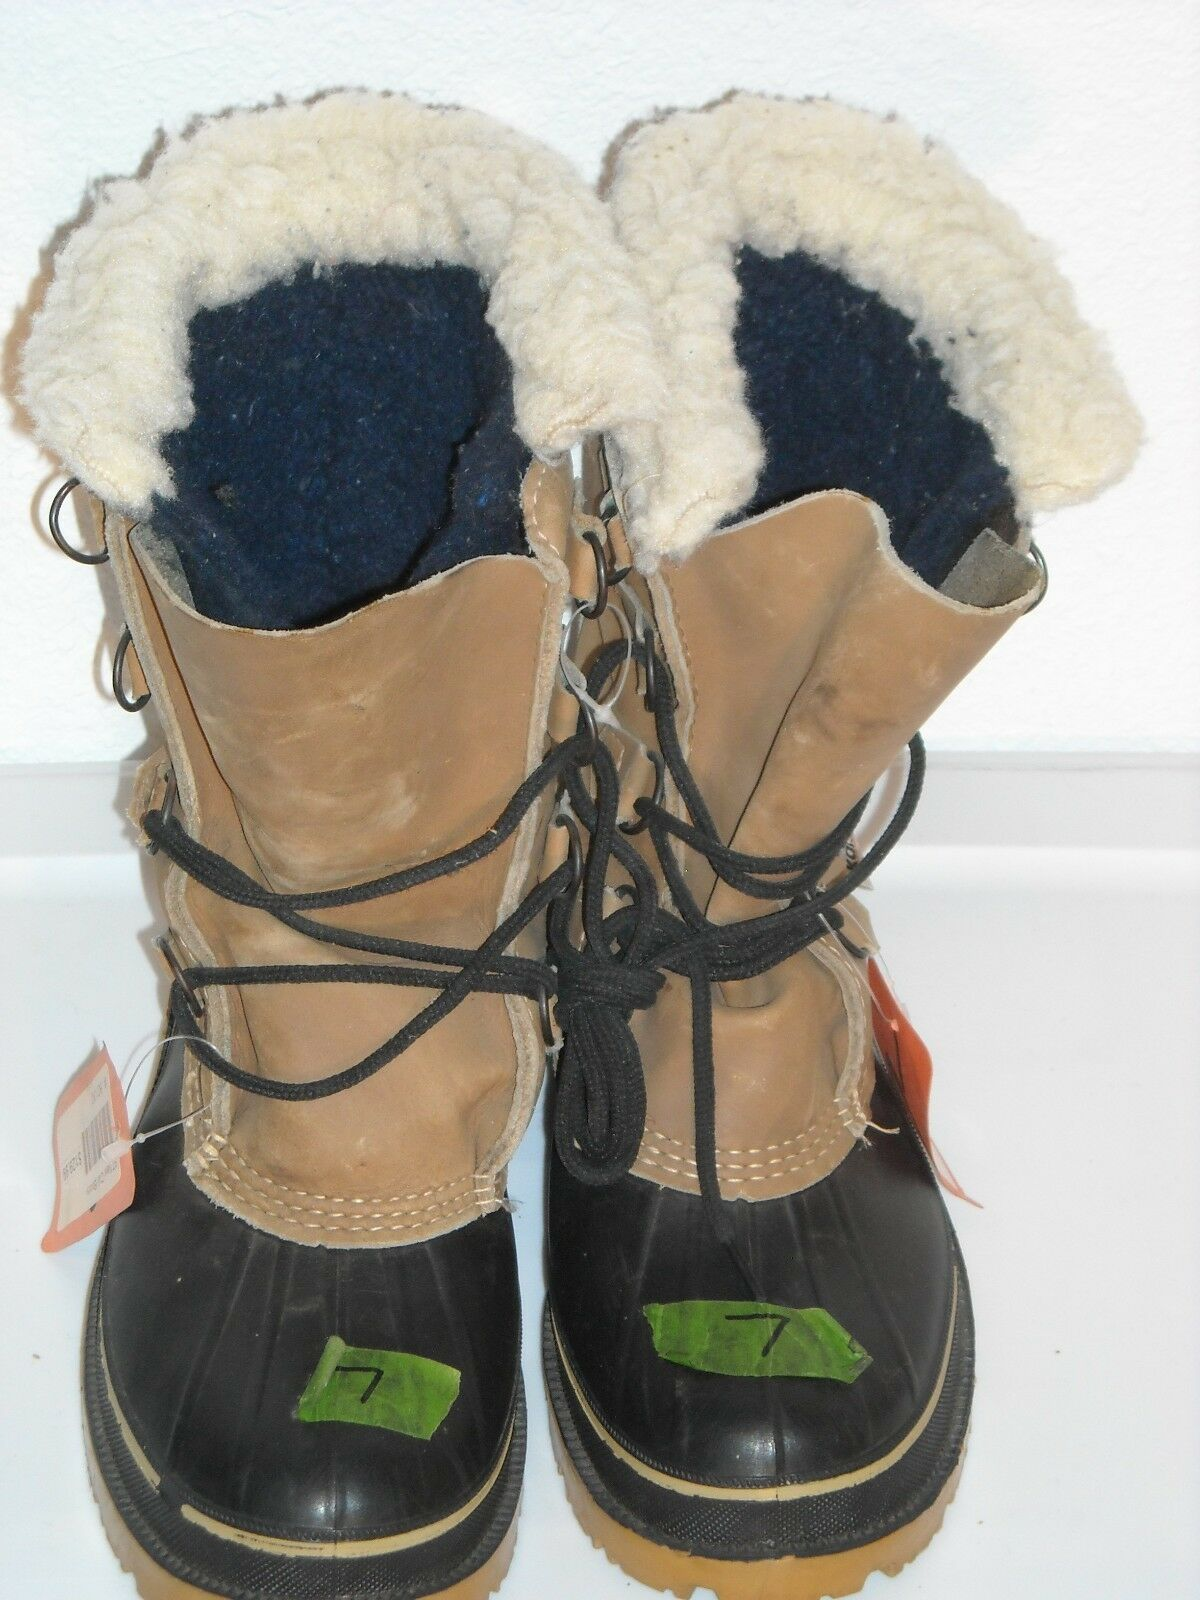 NEW Kamik KW 5000 Steel Shank Winter Boots - Size 7 -   (A1083)